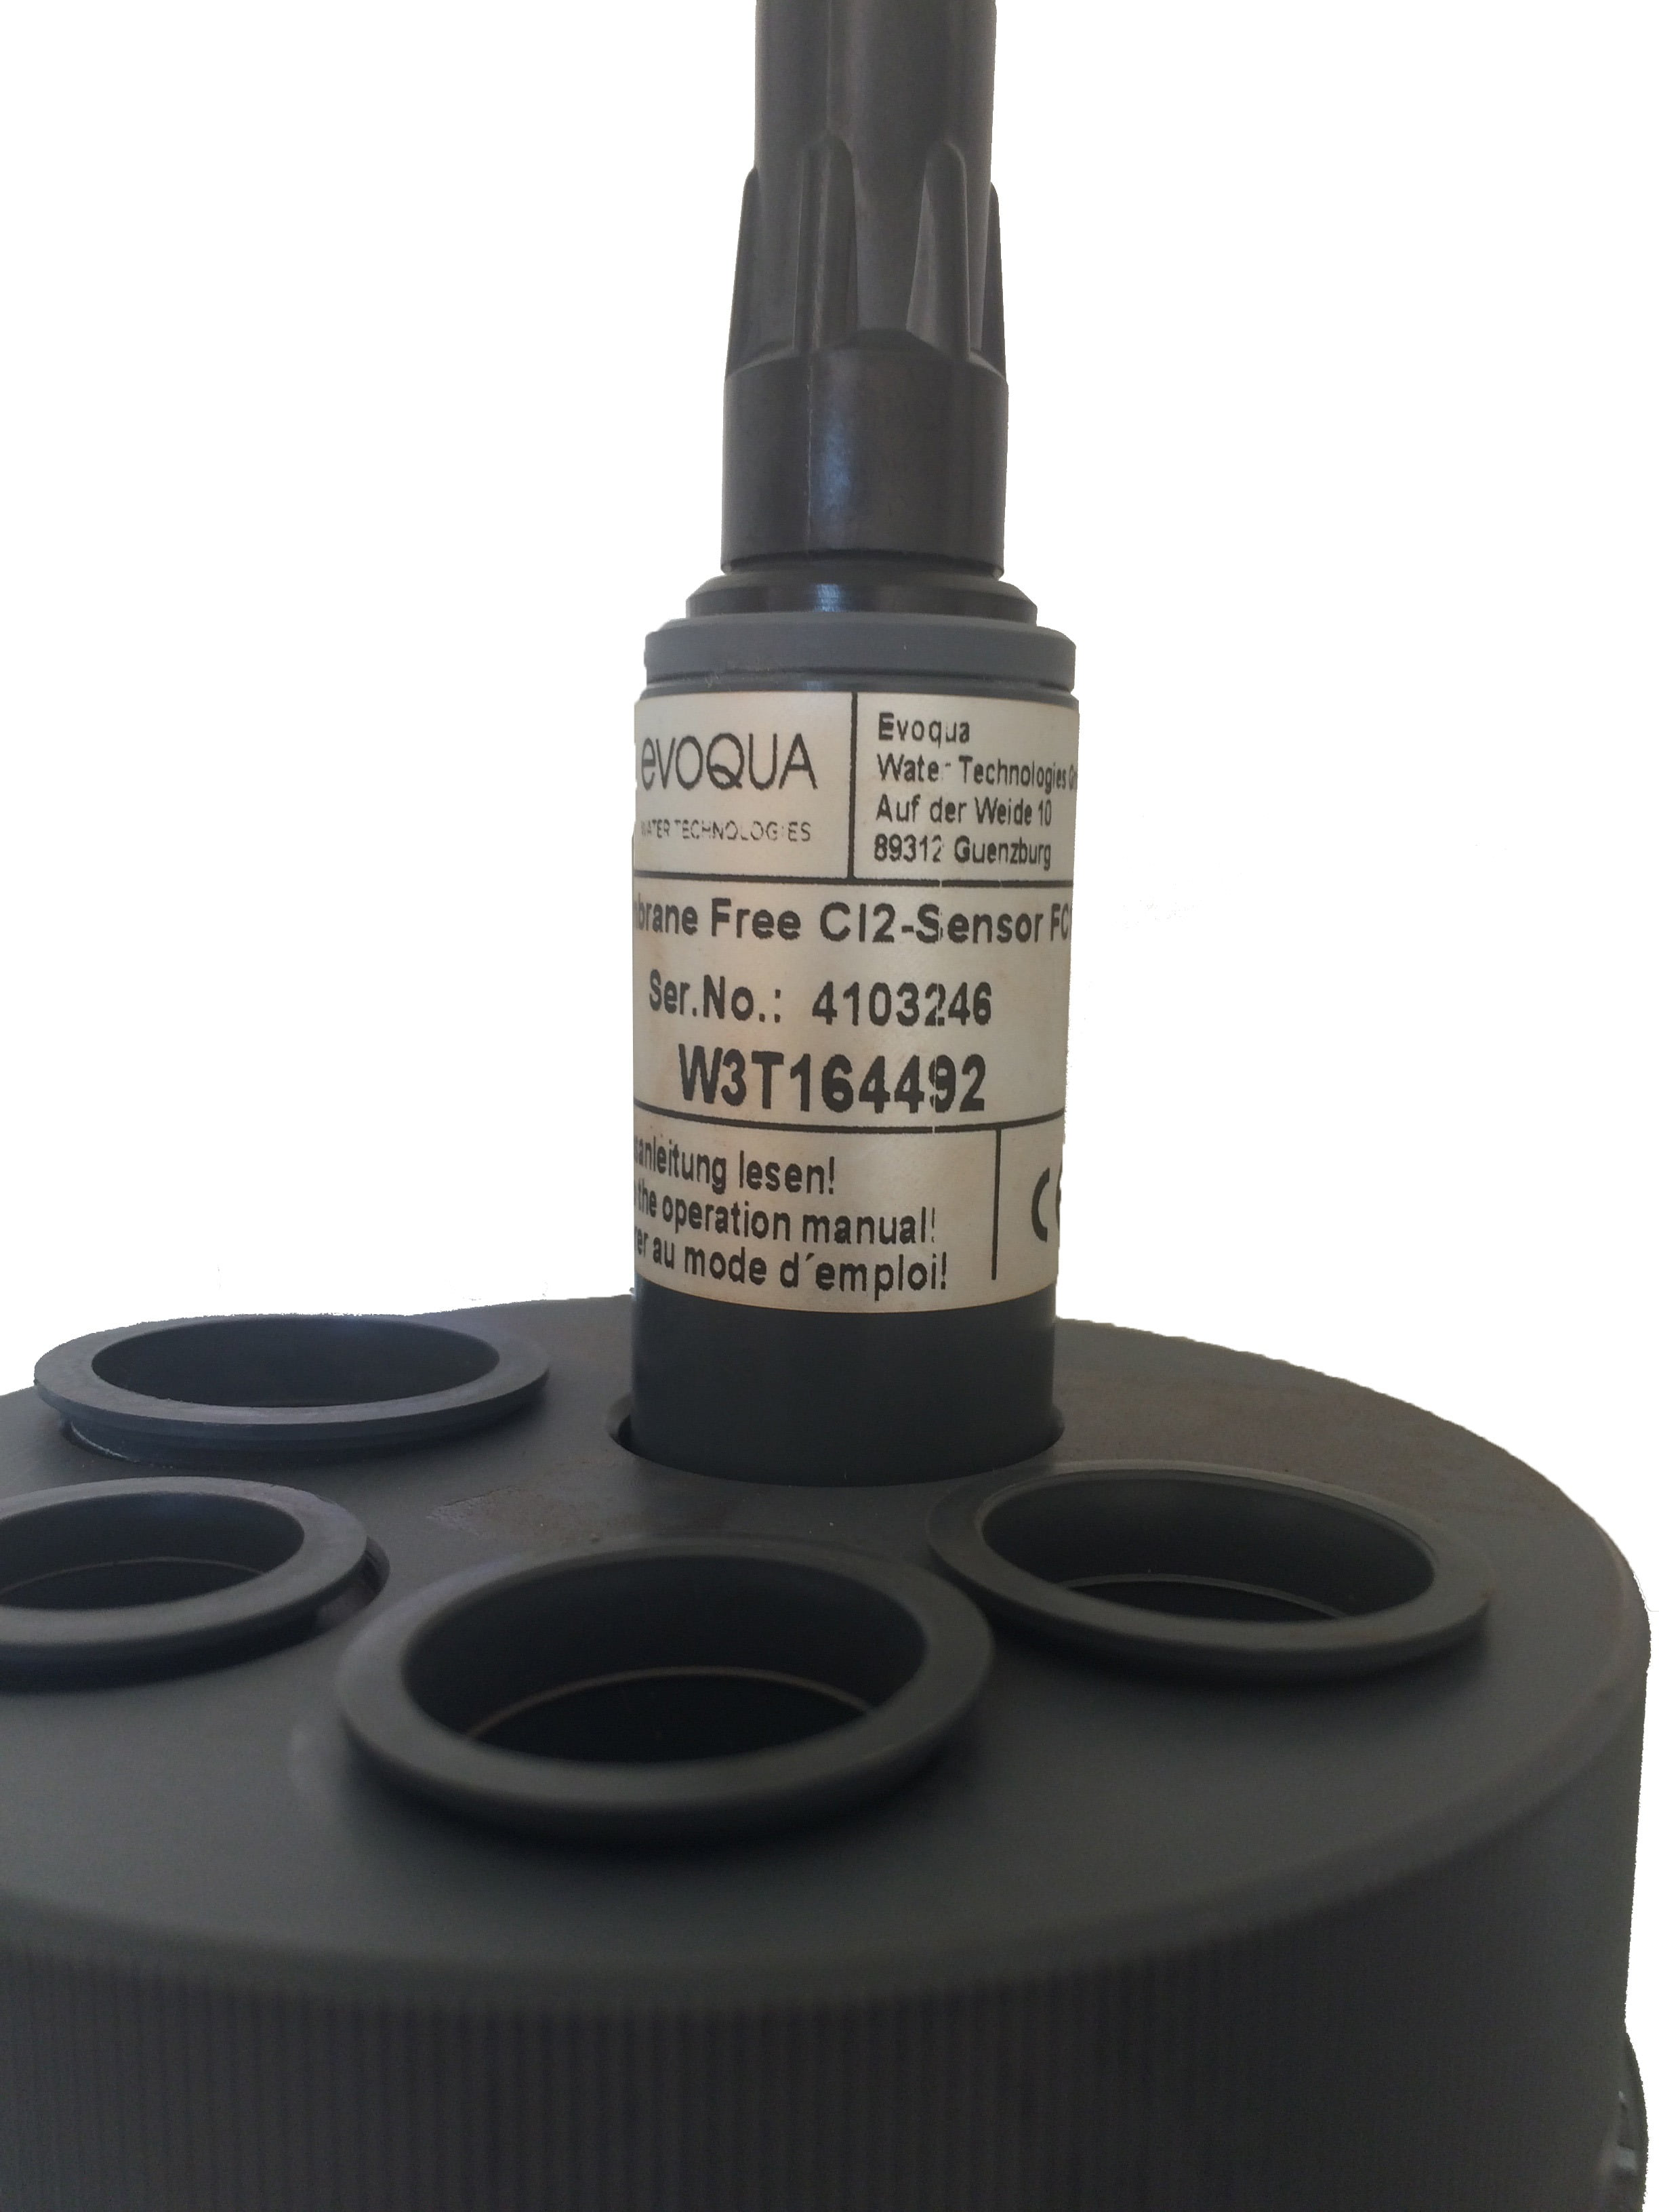 Free chlorine probe